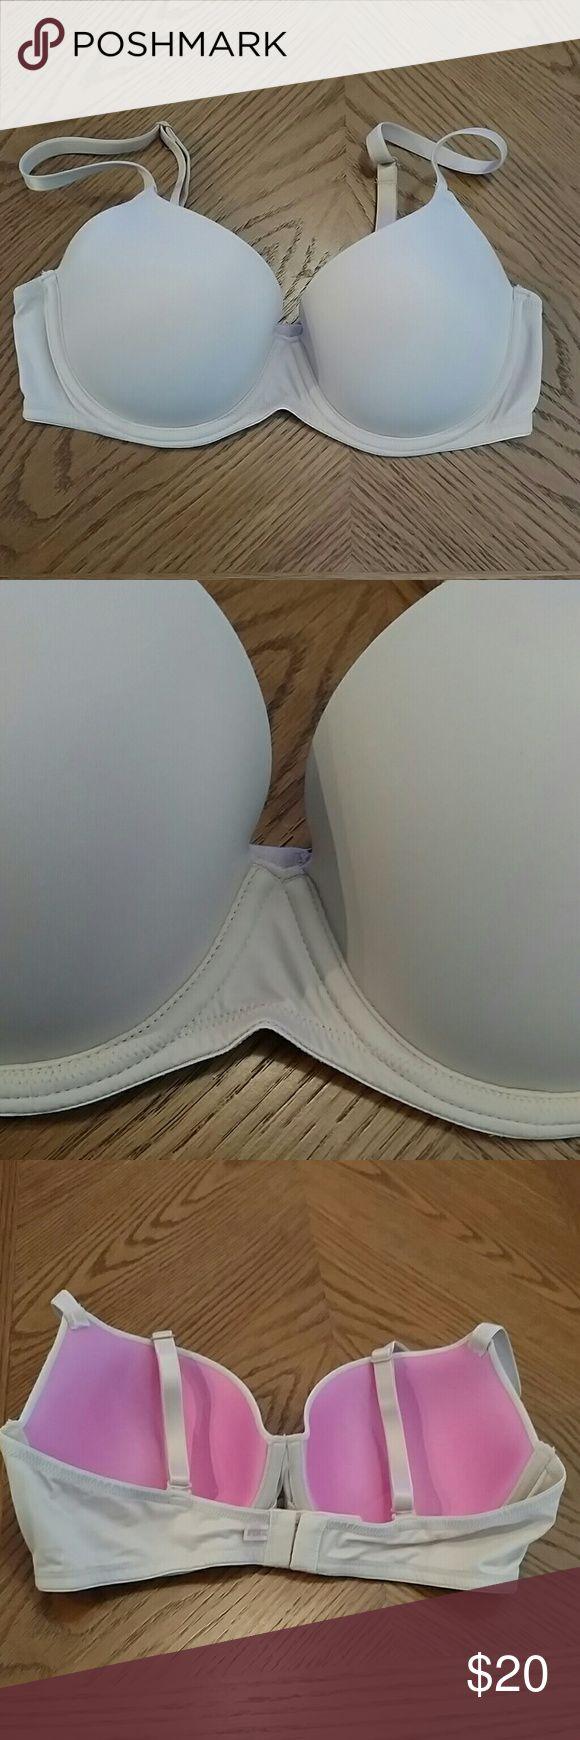 Victoria's Secret PINK Bra VS PINK lightly lined bra with multifunction adjustable straps. Like new condition! PINK Victoria's Secret Intimates & Sleepwear Bras